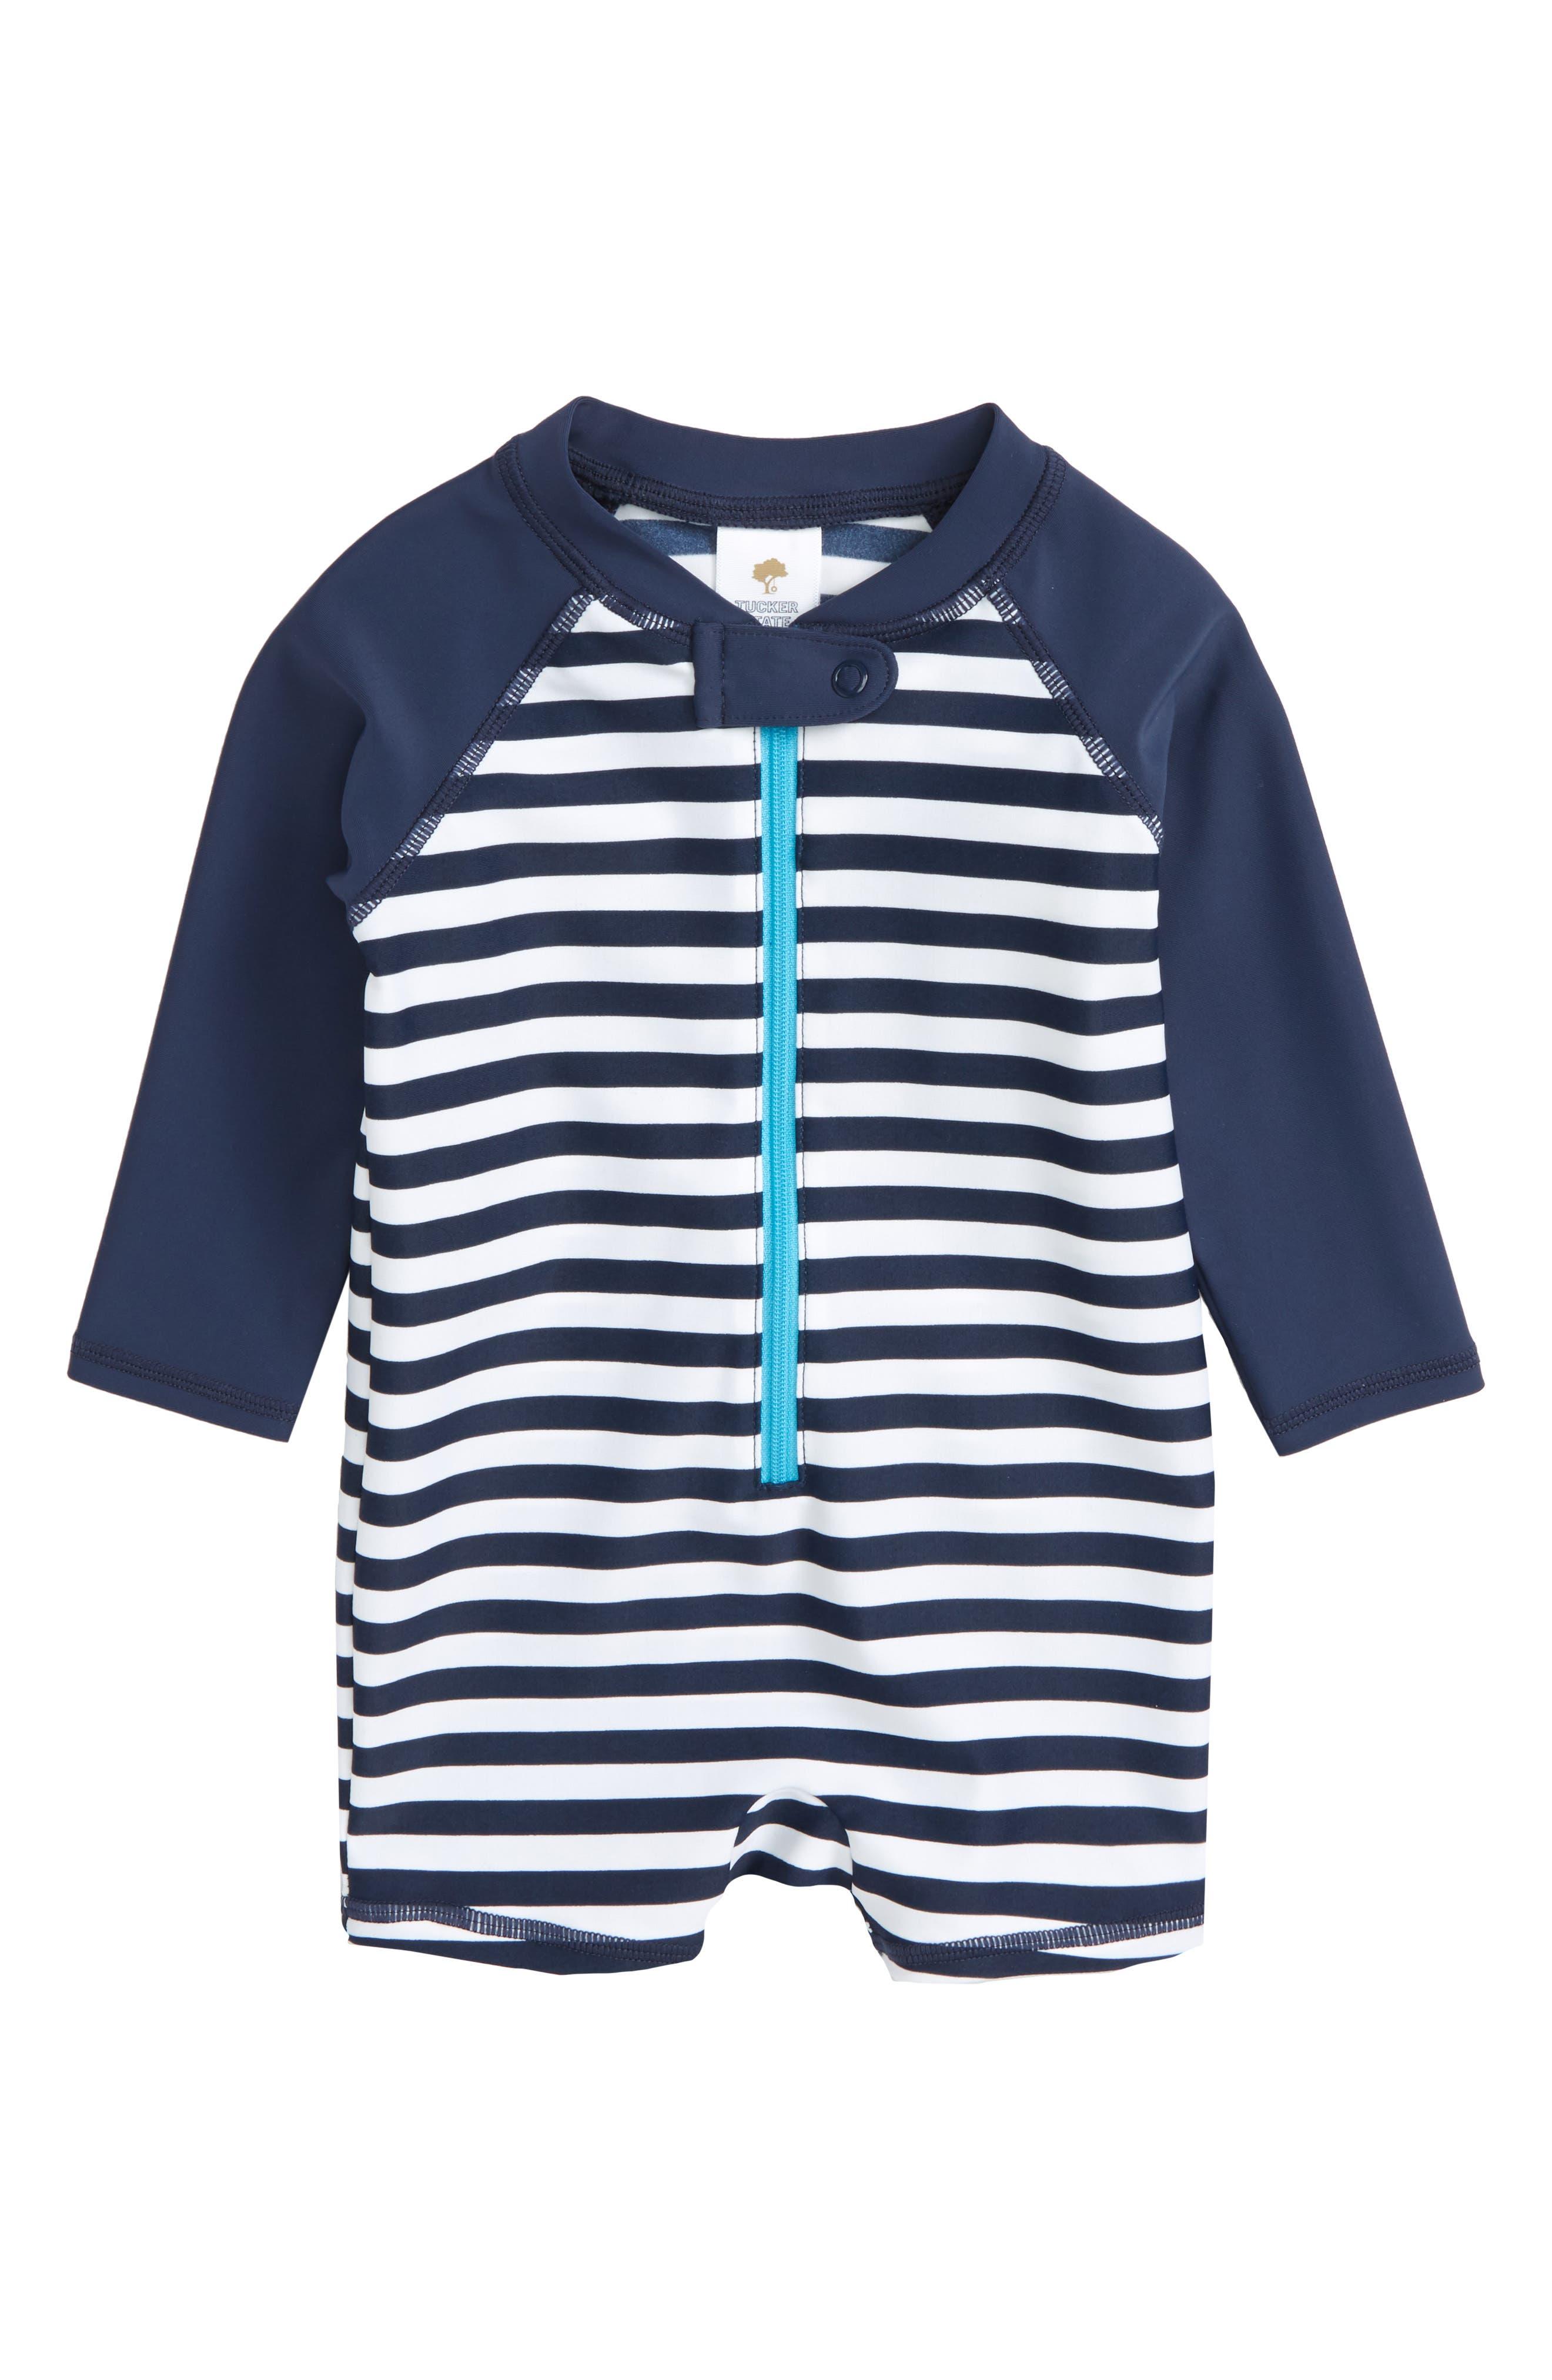 One-Piece Rashguard Swimsuit,                         Main,                         color, 410